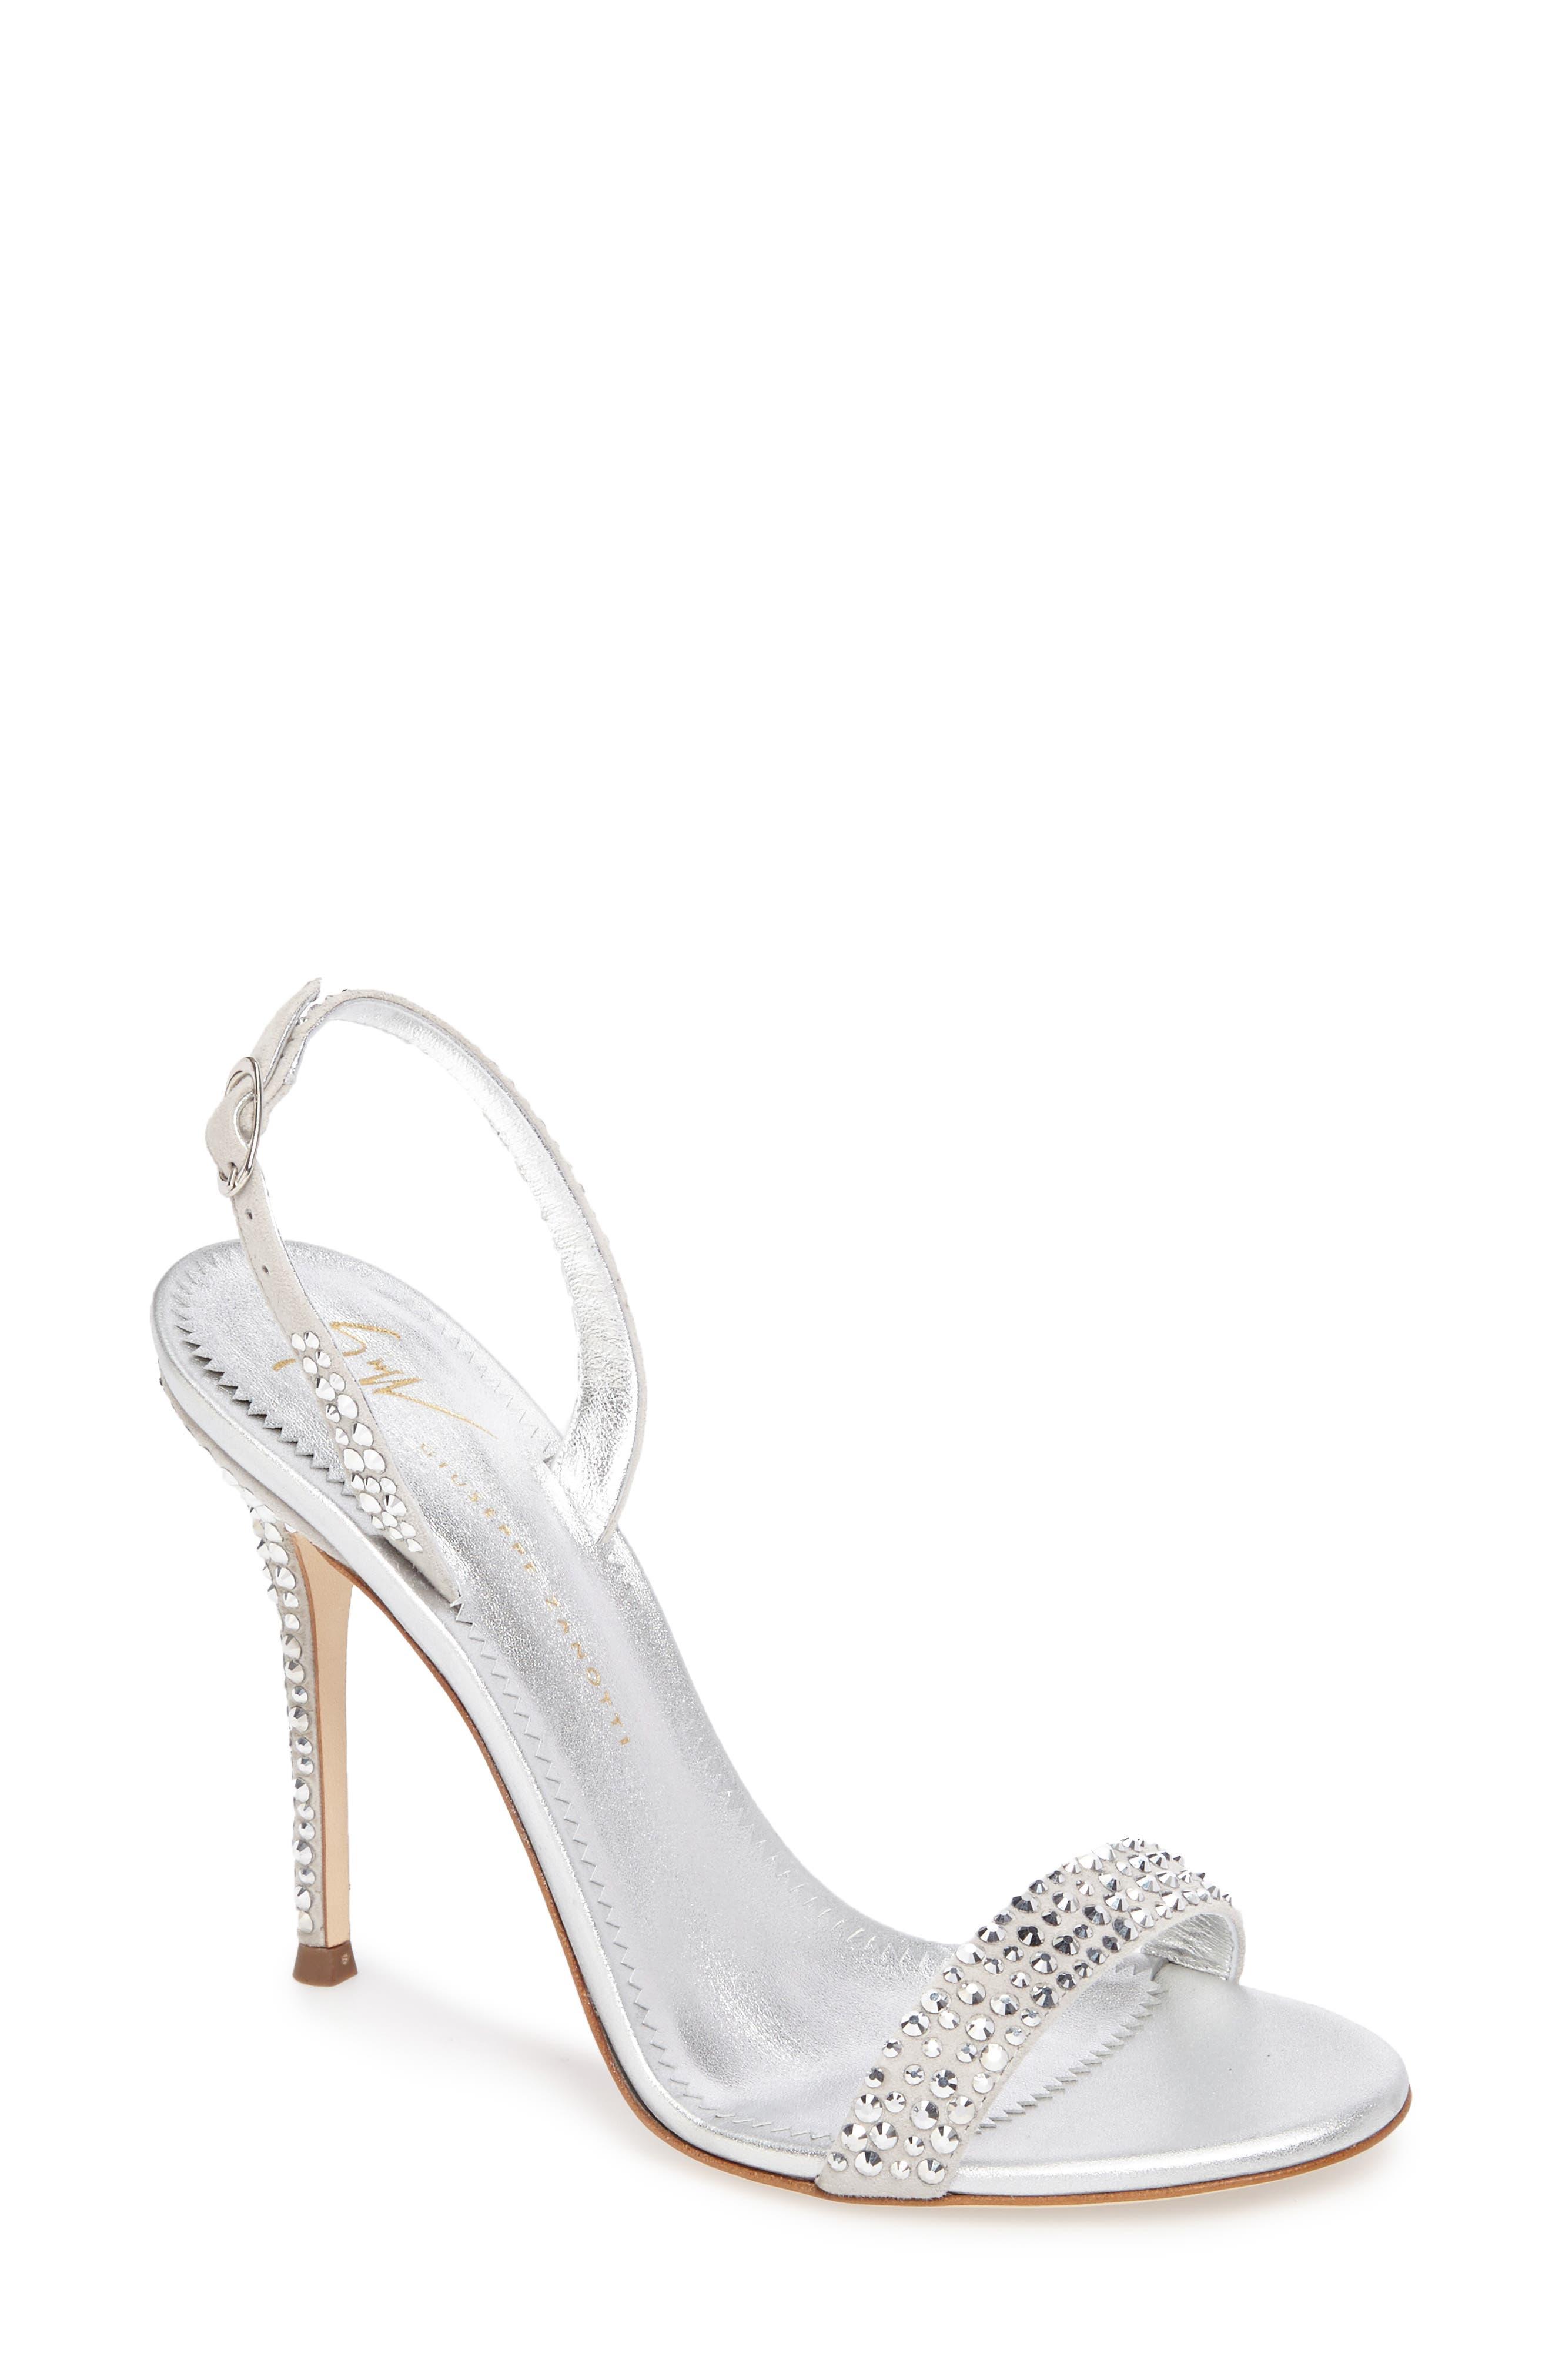 Musitco Crystal Embellished Slingback Sandal,                             Main thumbnail 1, color,                             054